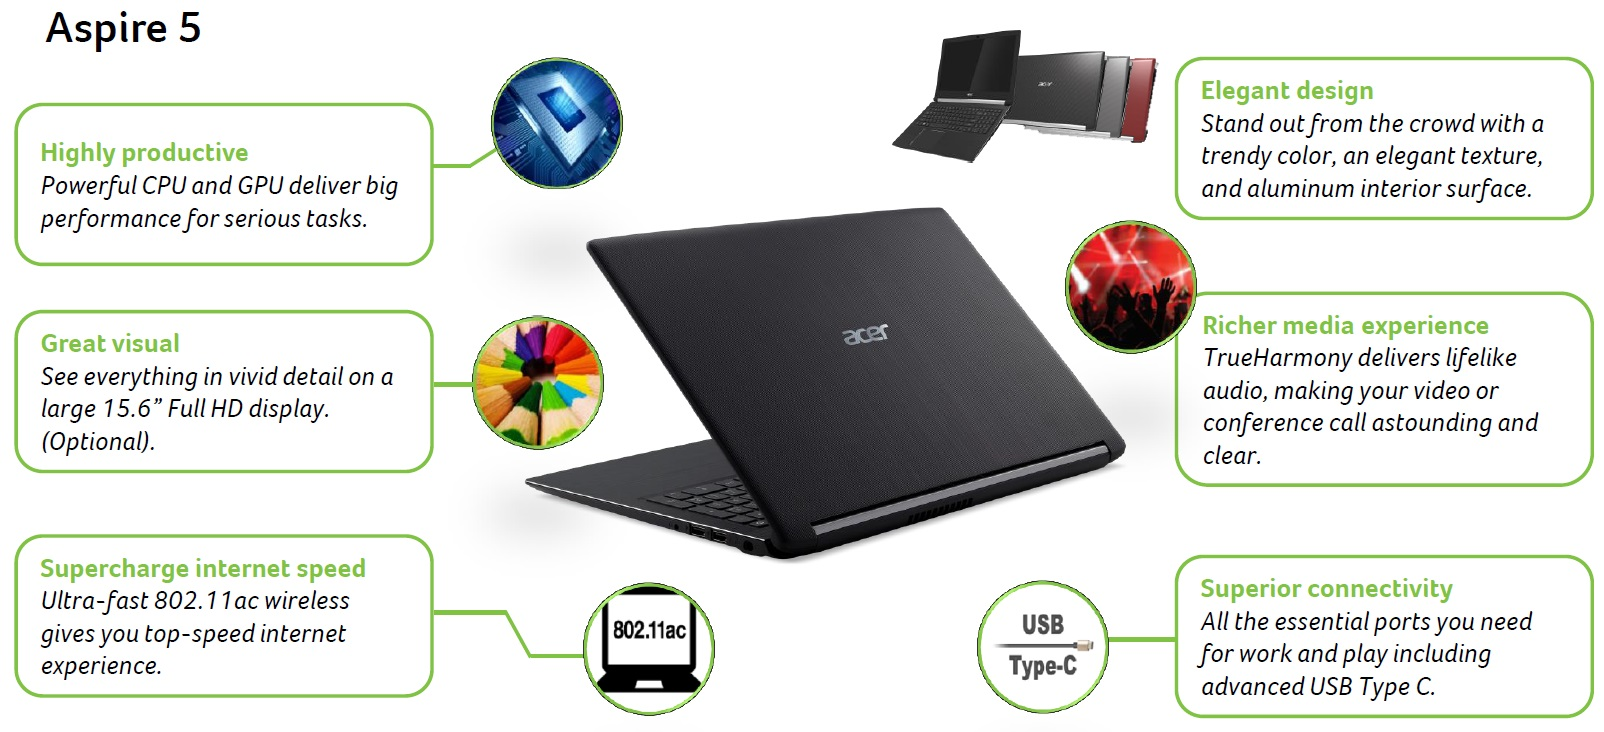 Acer Aspire 5 600 04